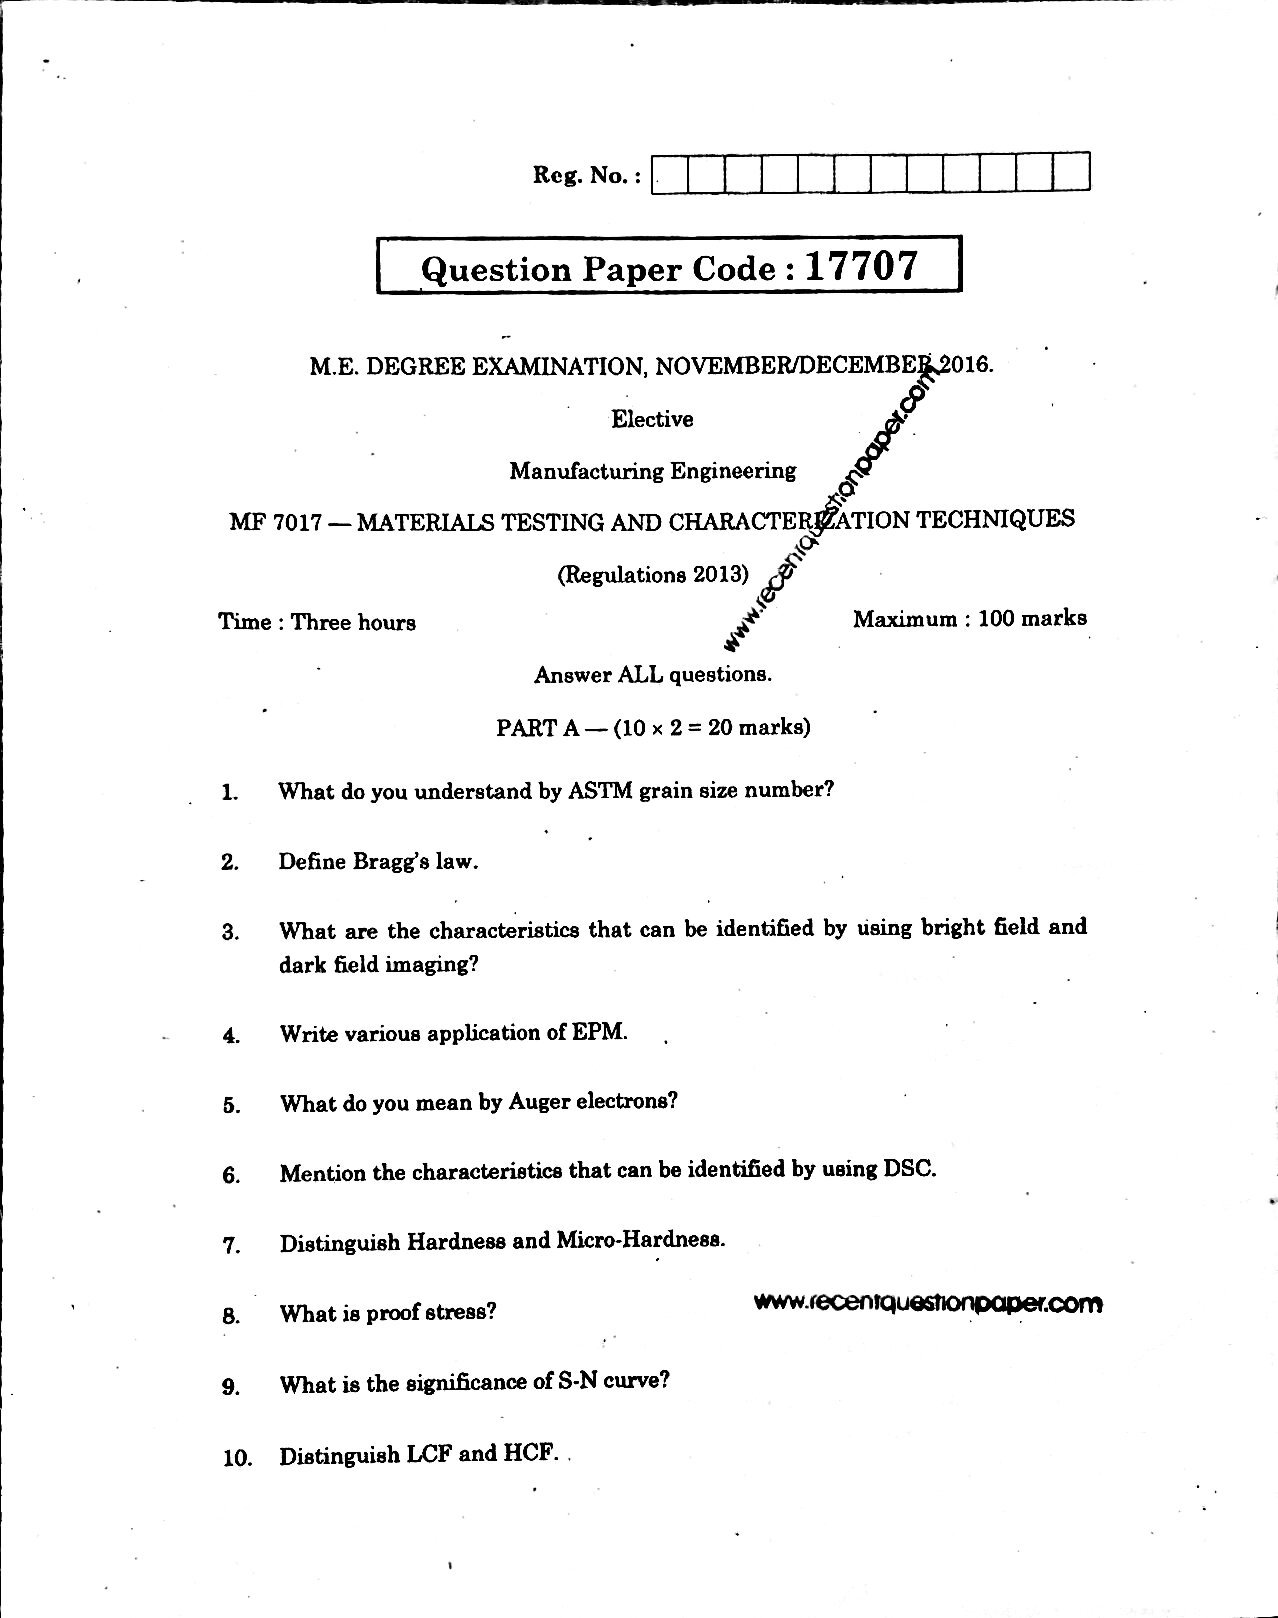 MF7017 MaterialsTesting And Characterlation Techniques Anna University Question paper Nov/Dec 2016